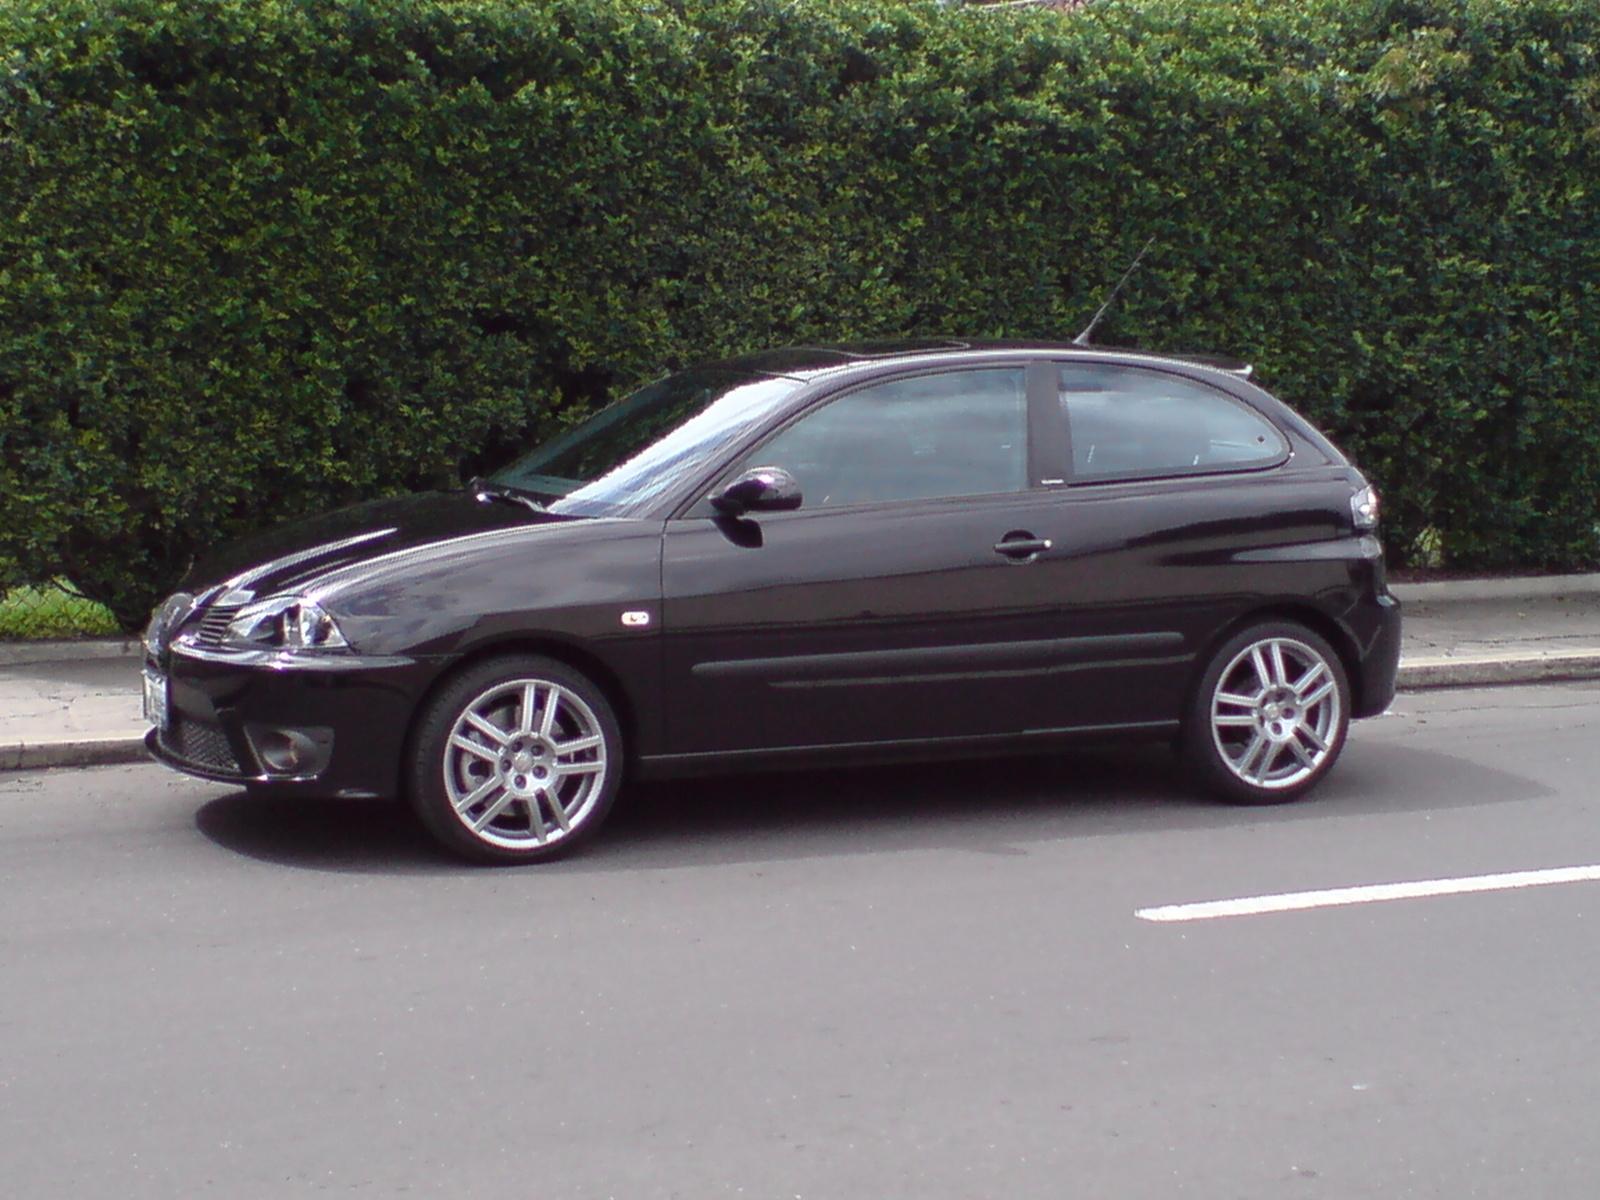 Original furthermore  moreover Seat Ibiza Pic X together with Seat Ibiza Pic X together with Seat Alhambra Pic. on 1997 seat ibiza pictures cargurus